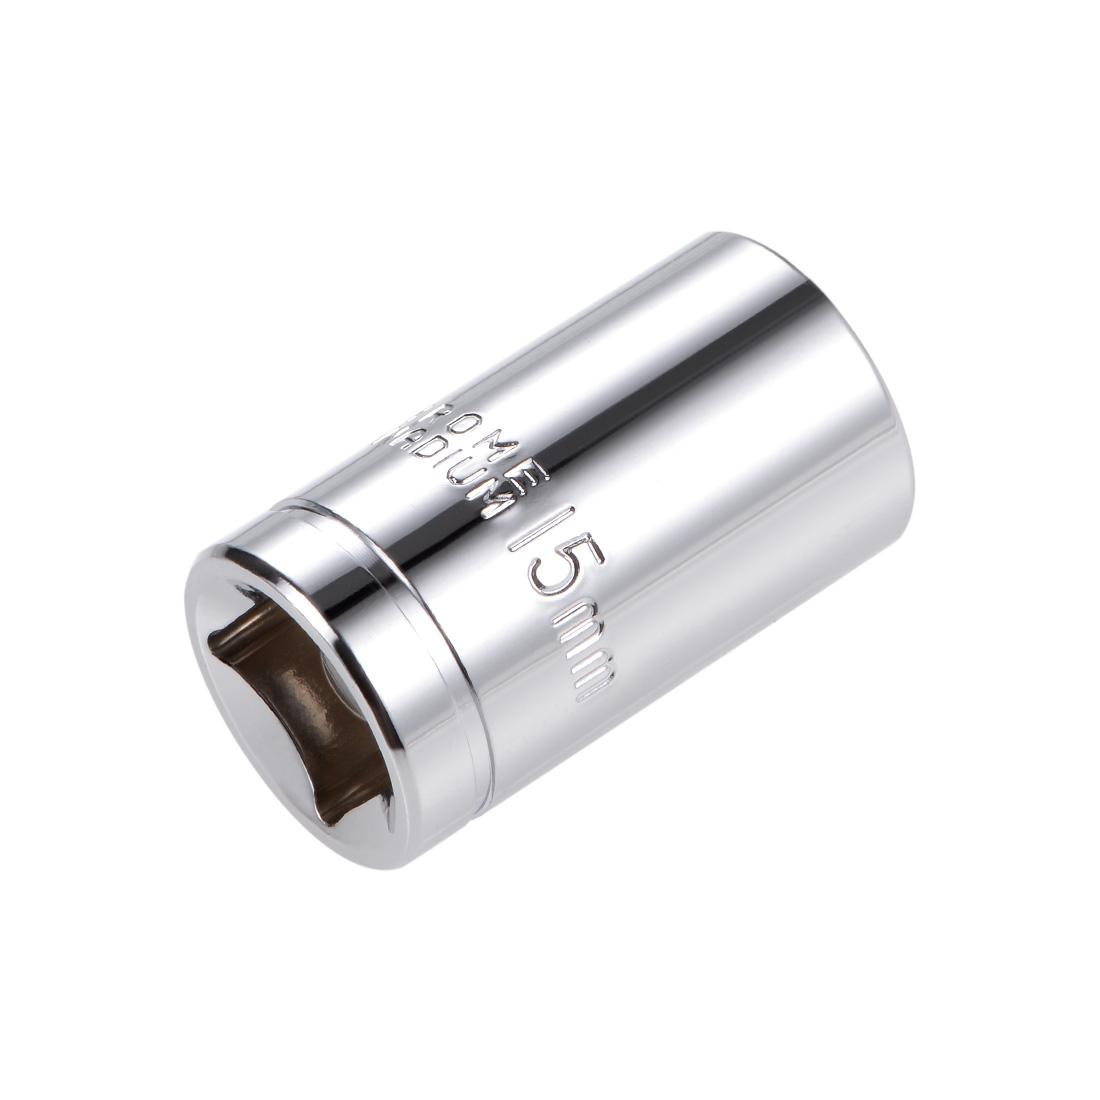 1/2-inch Drive E15 Universal Spline Socket Shallow 12 Point Cr-V Steel